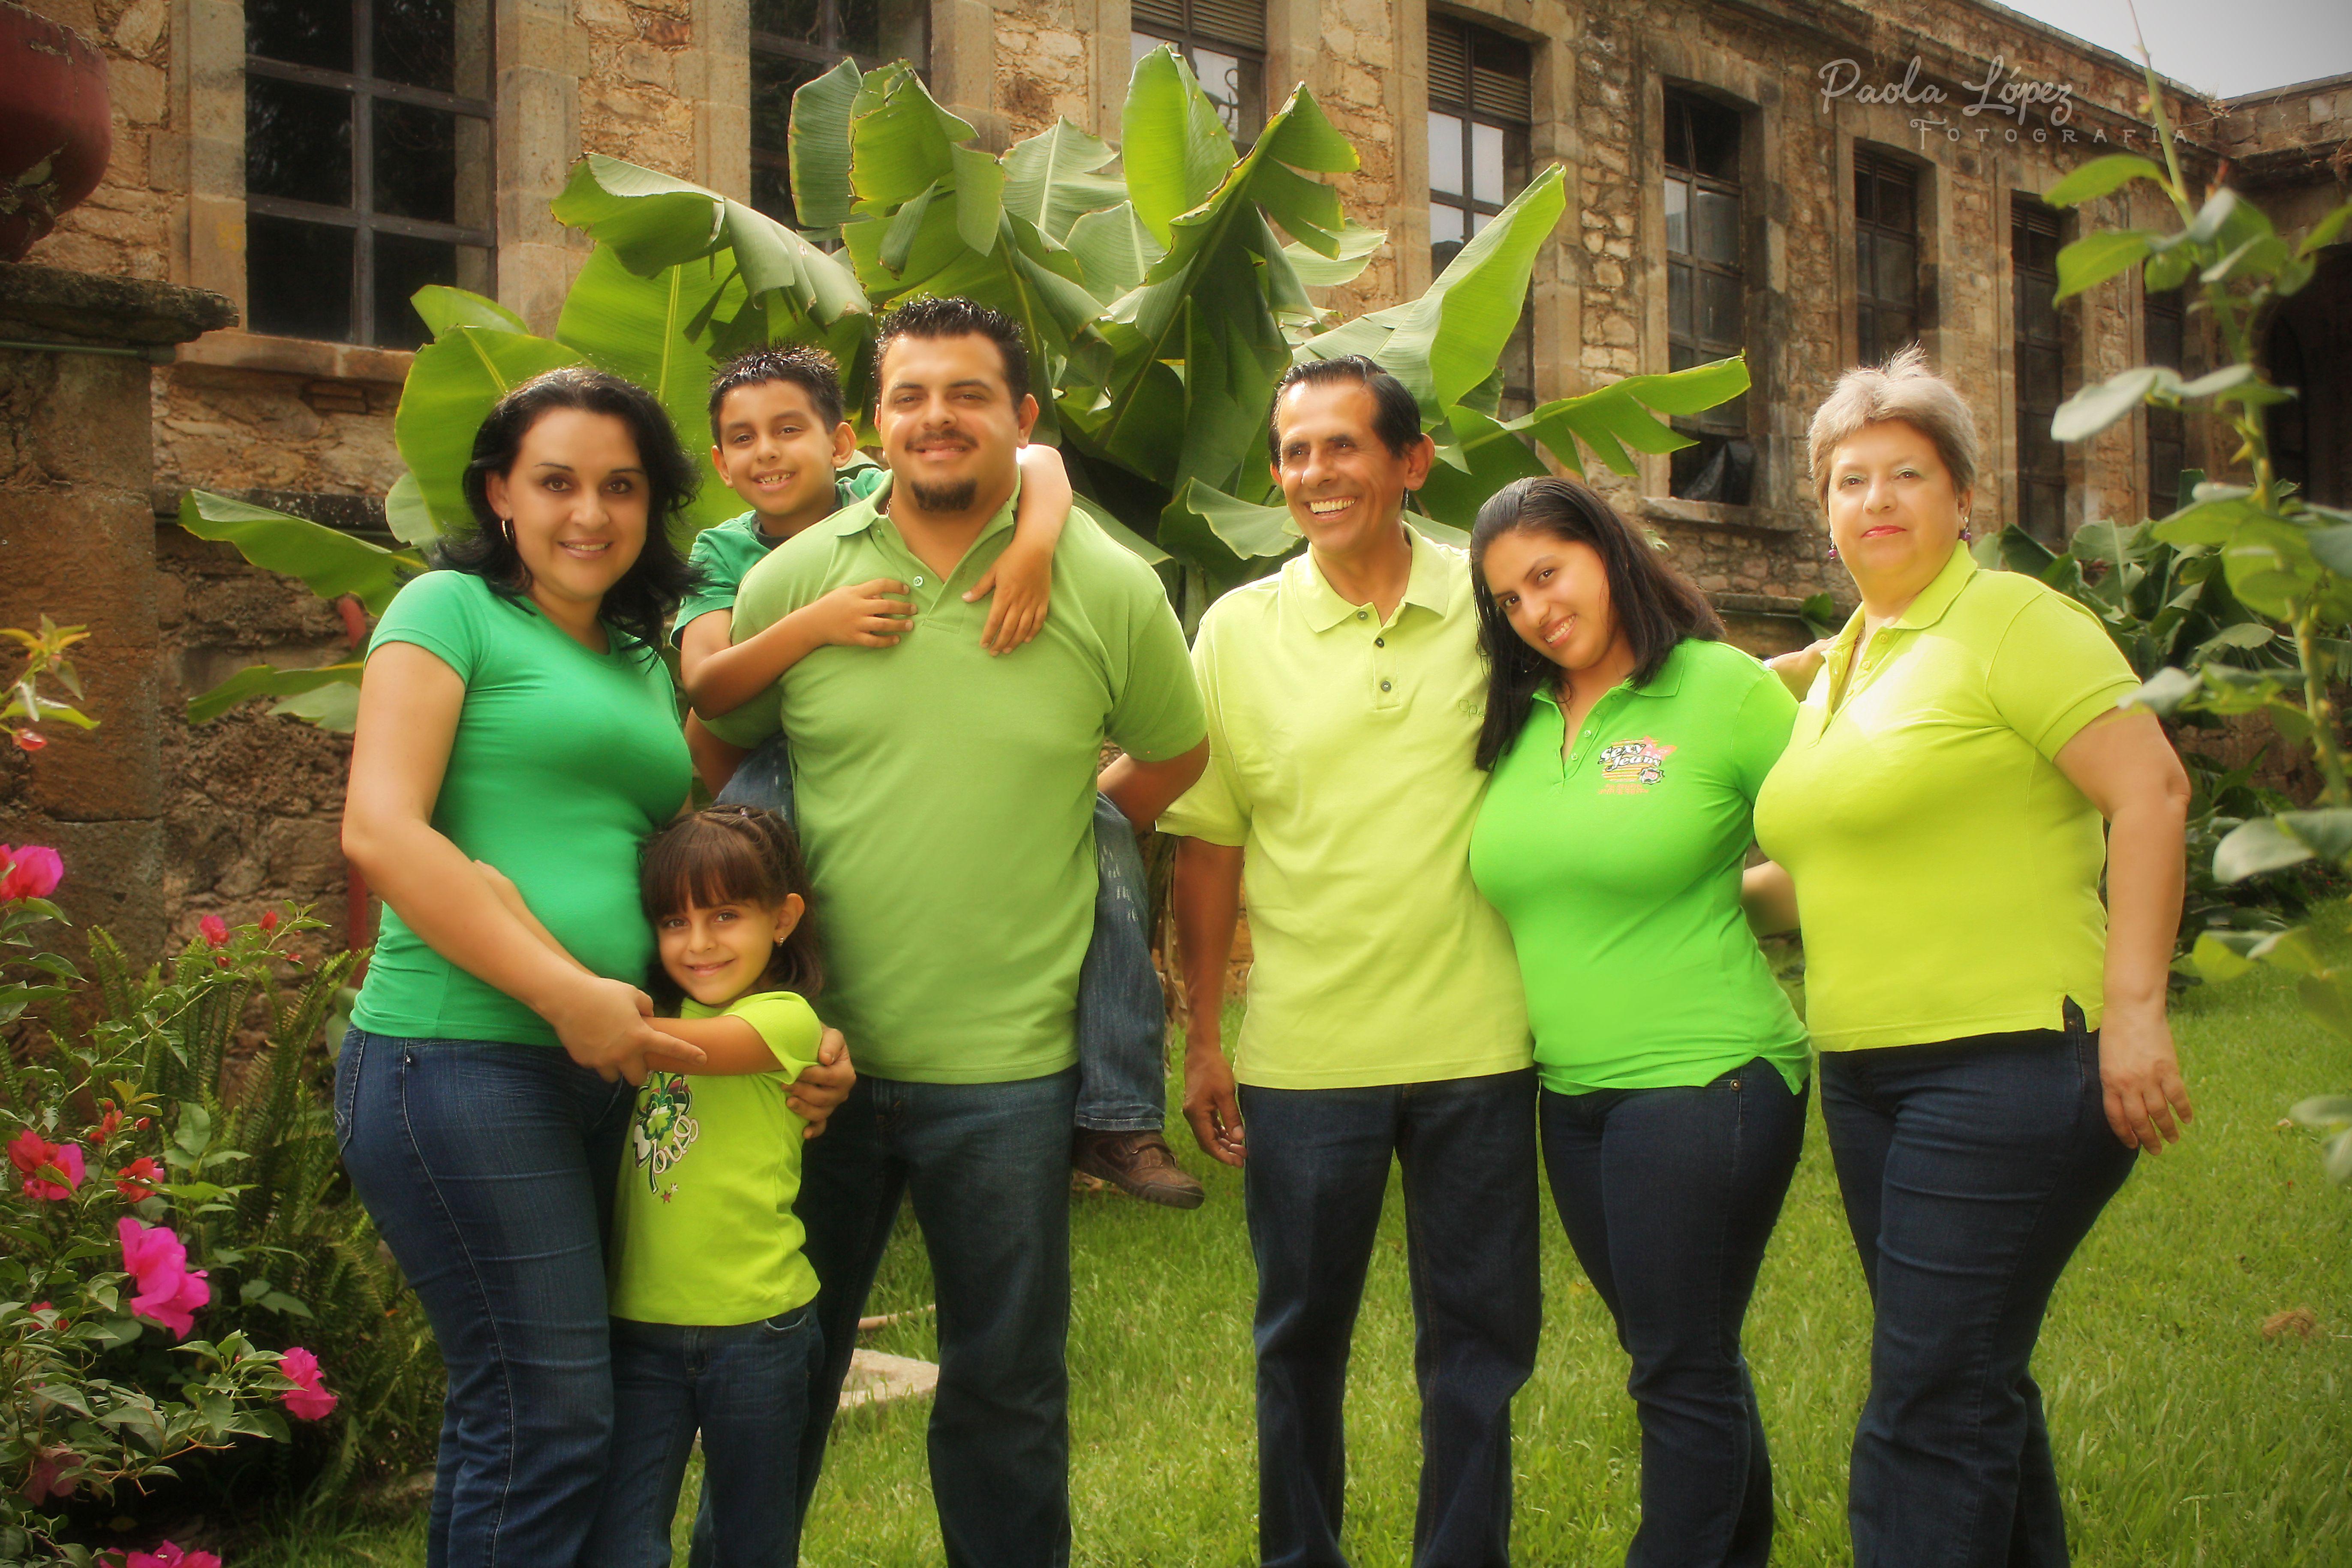 All Rights Reserved© Paola López | Fotografía. / contact: pao_fotografics @ hotmail.com or facebook/fotografics #FamilyPhotoshoot #Mexico